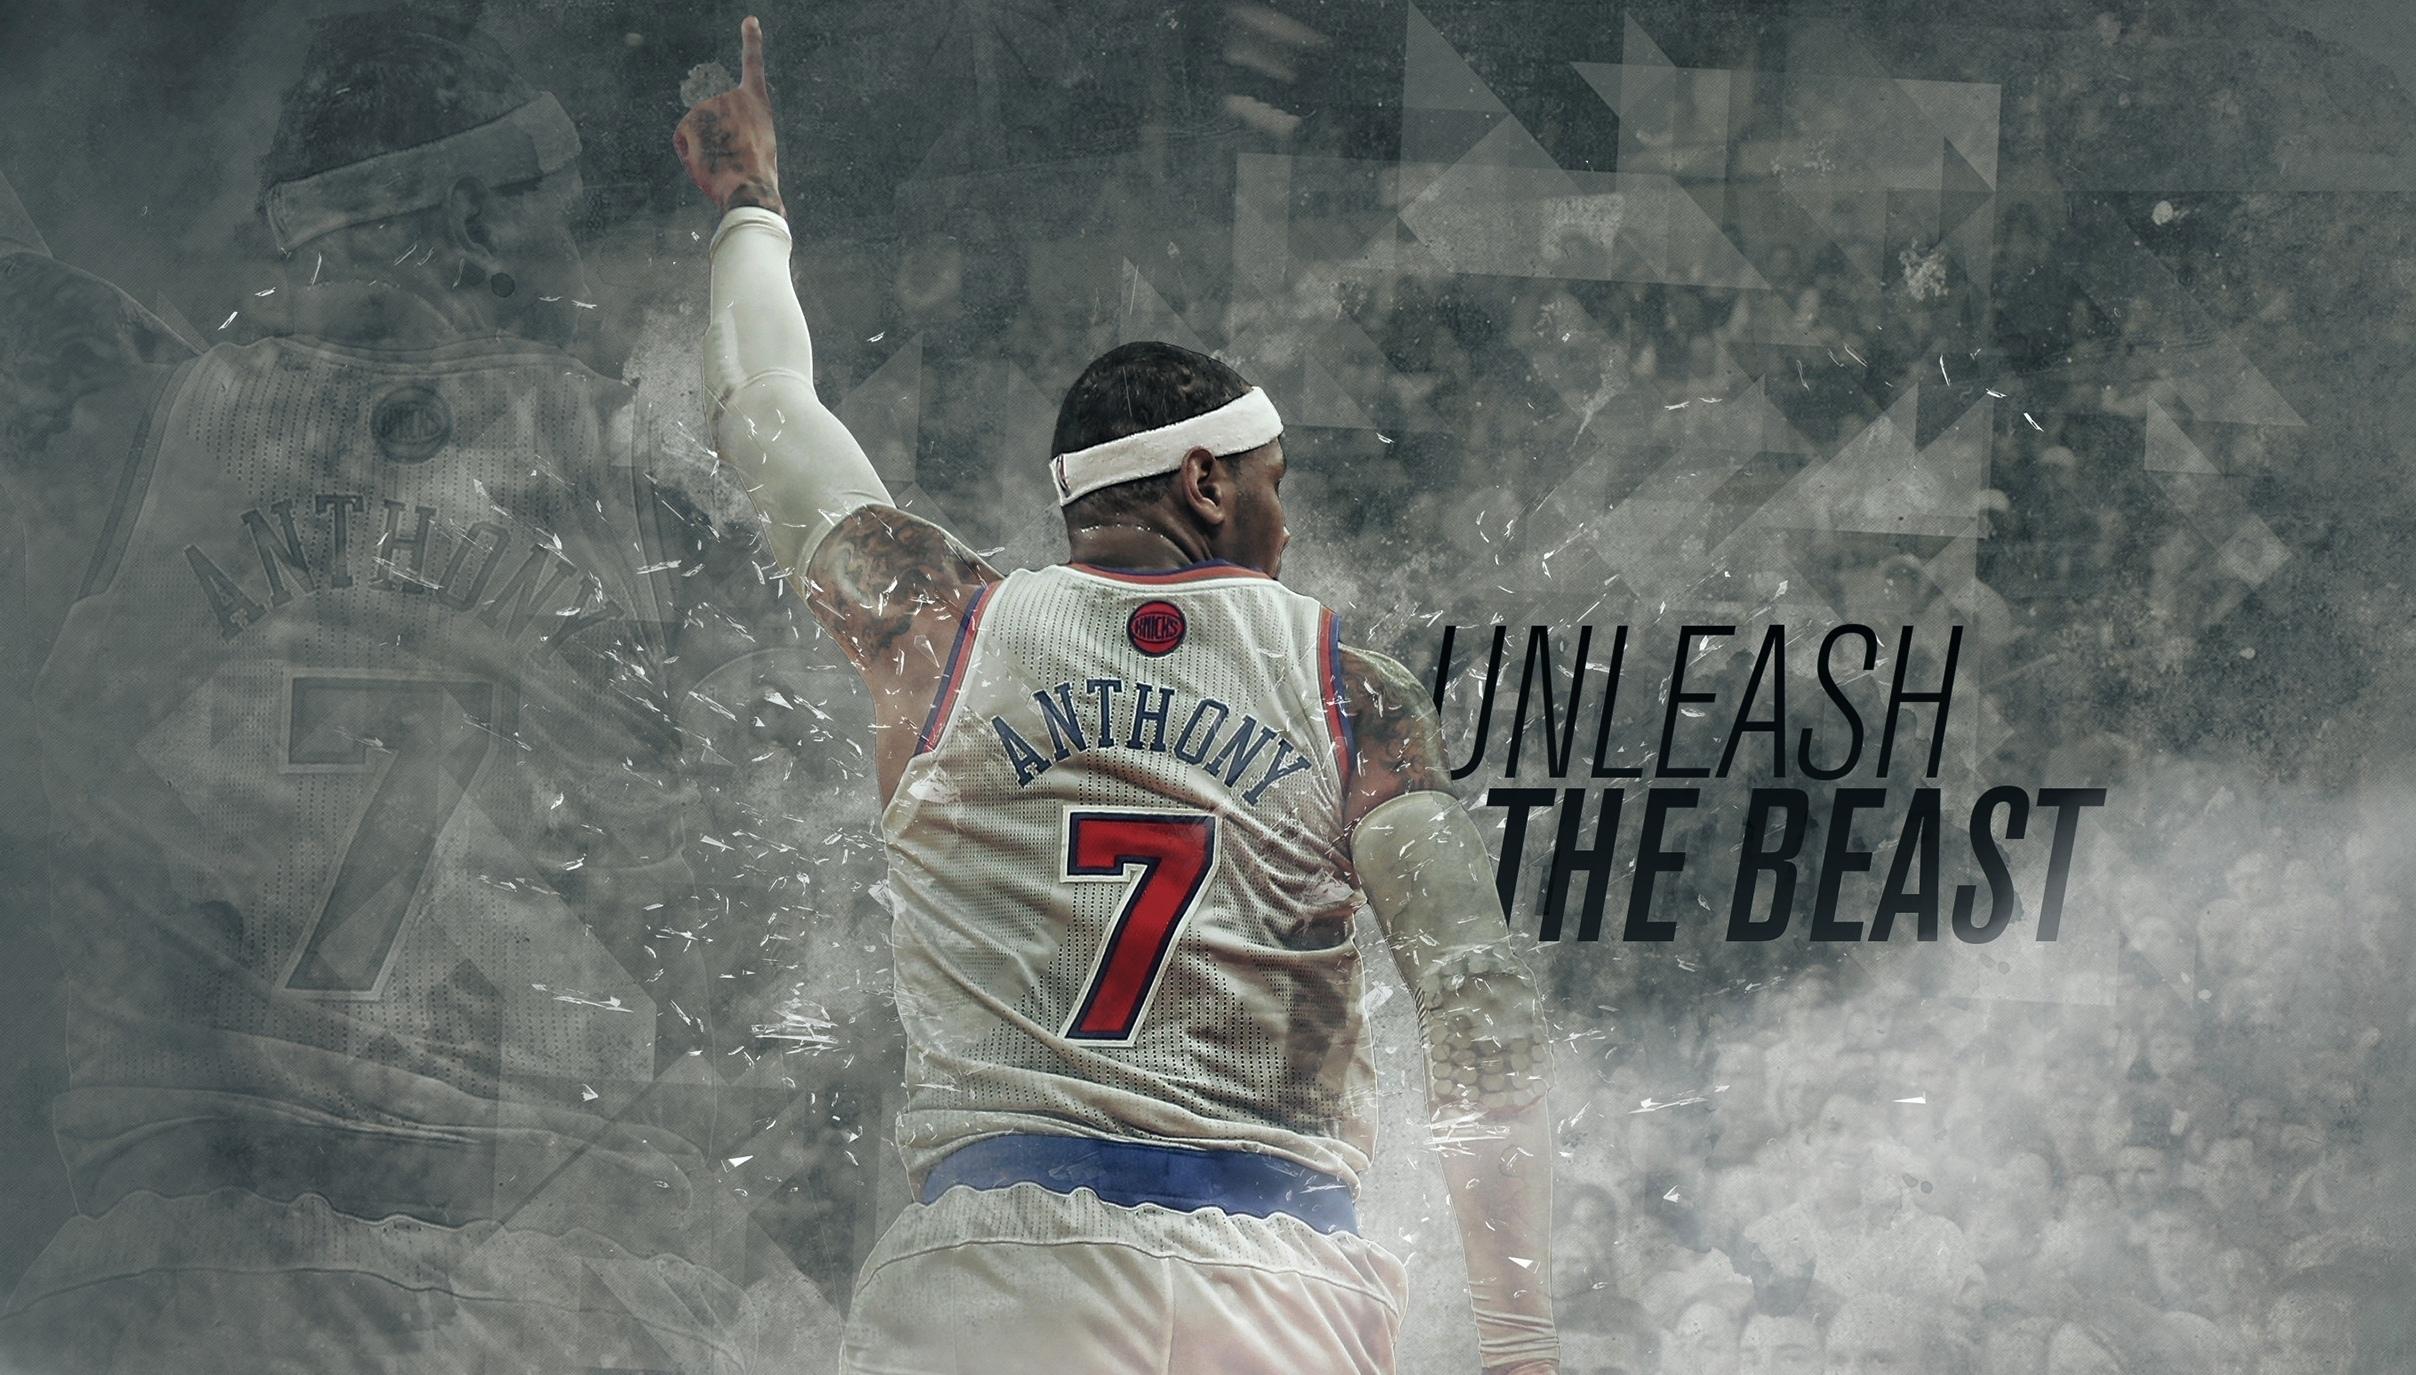 Sports Nba Carmelo Anthony New York Basketball 7 Knicks Wallpaper